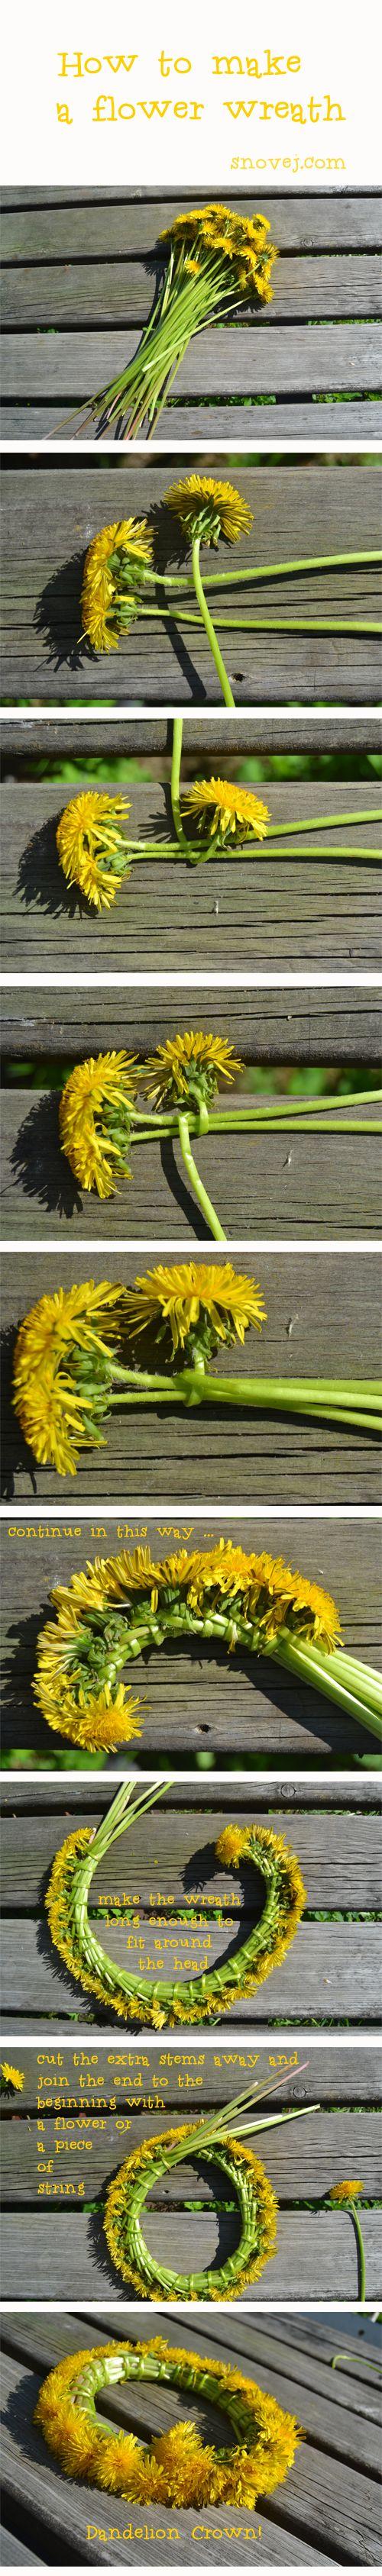 Dandelion Wreath and Appetizer!